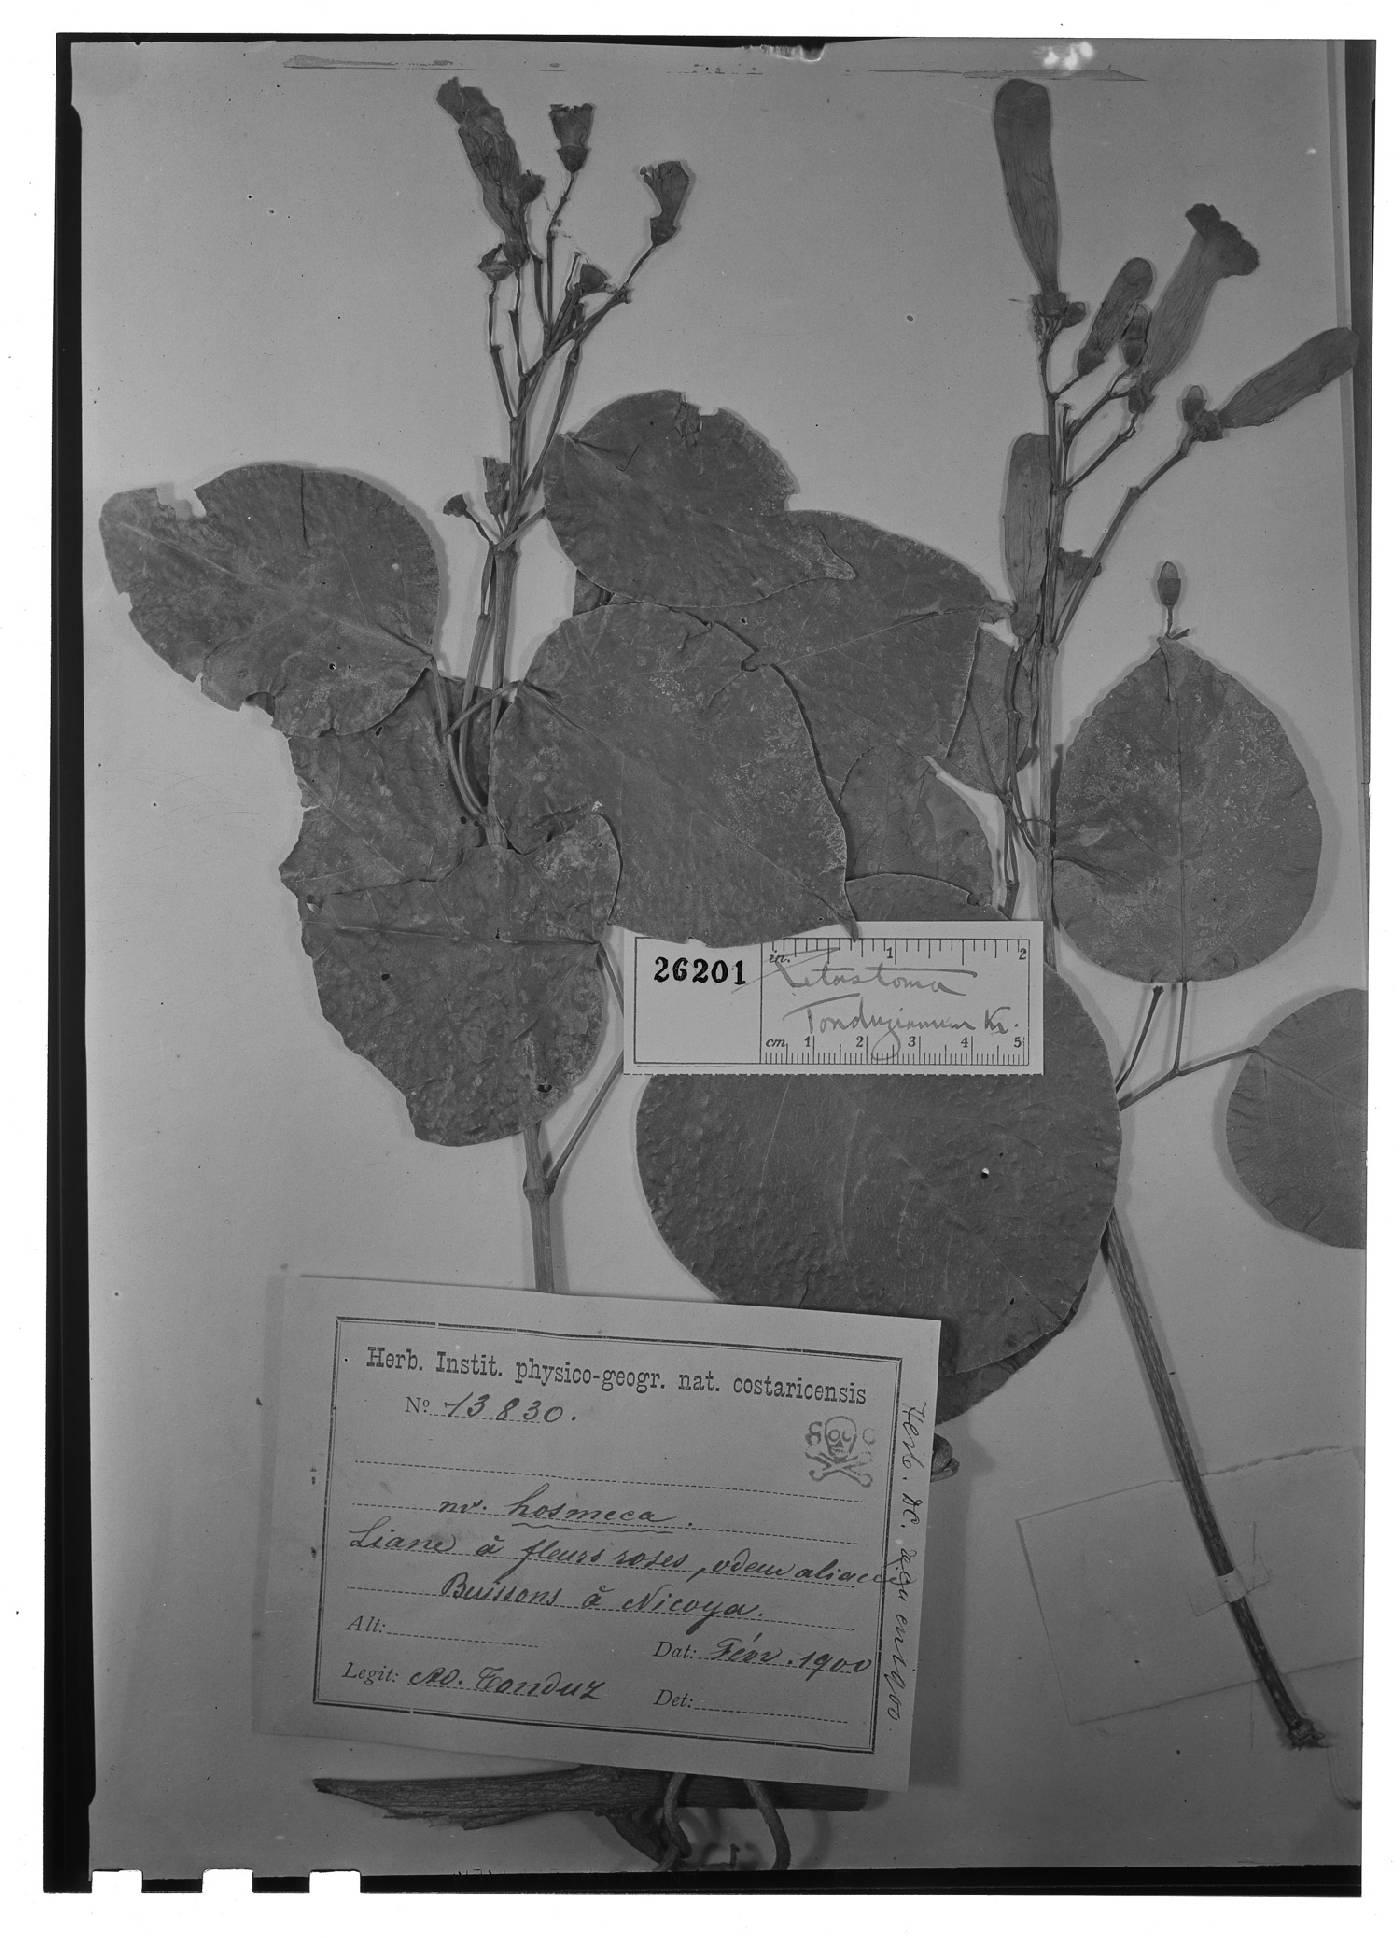 Mansoa hymenaea image